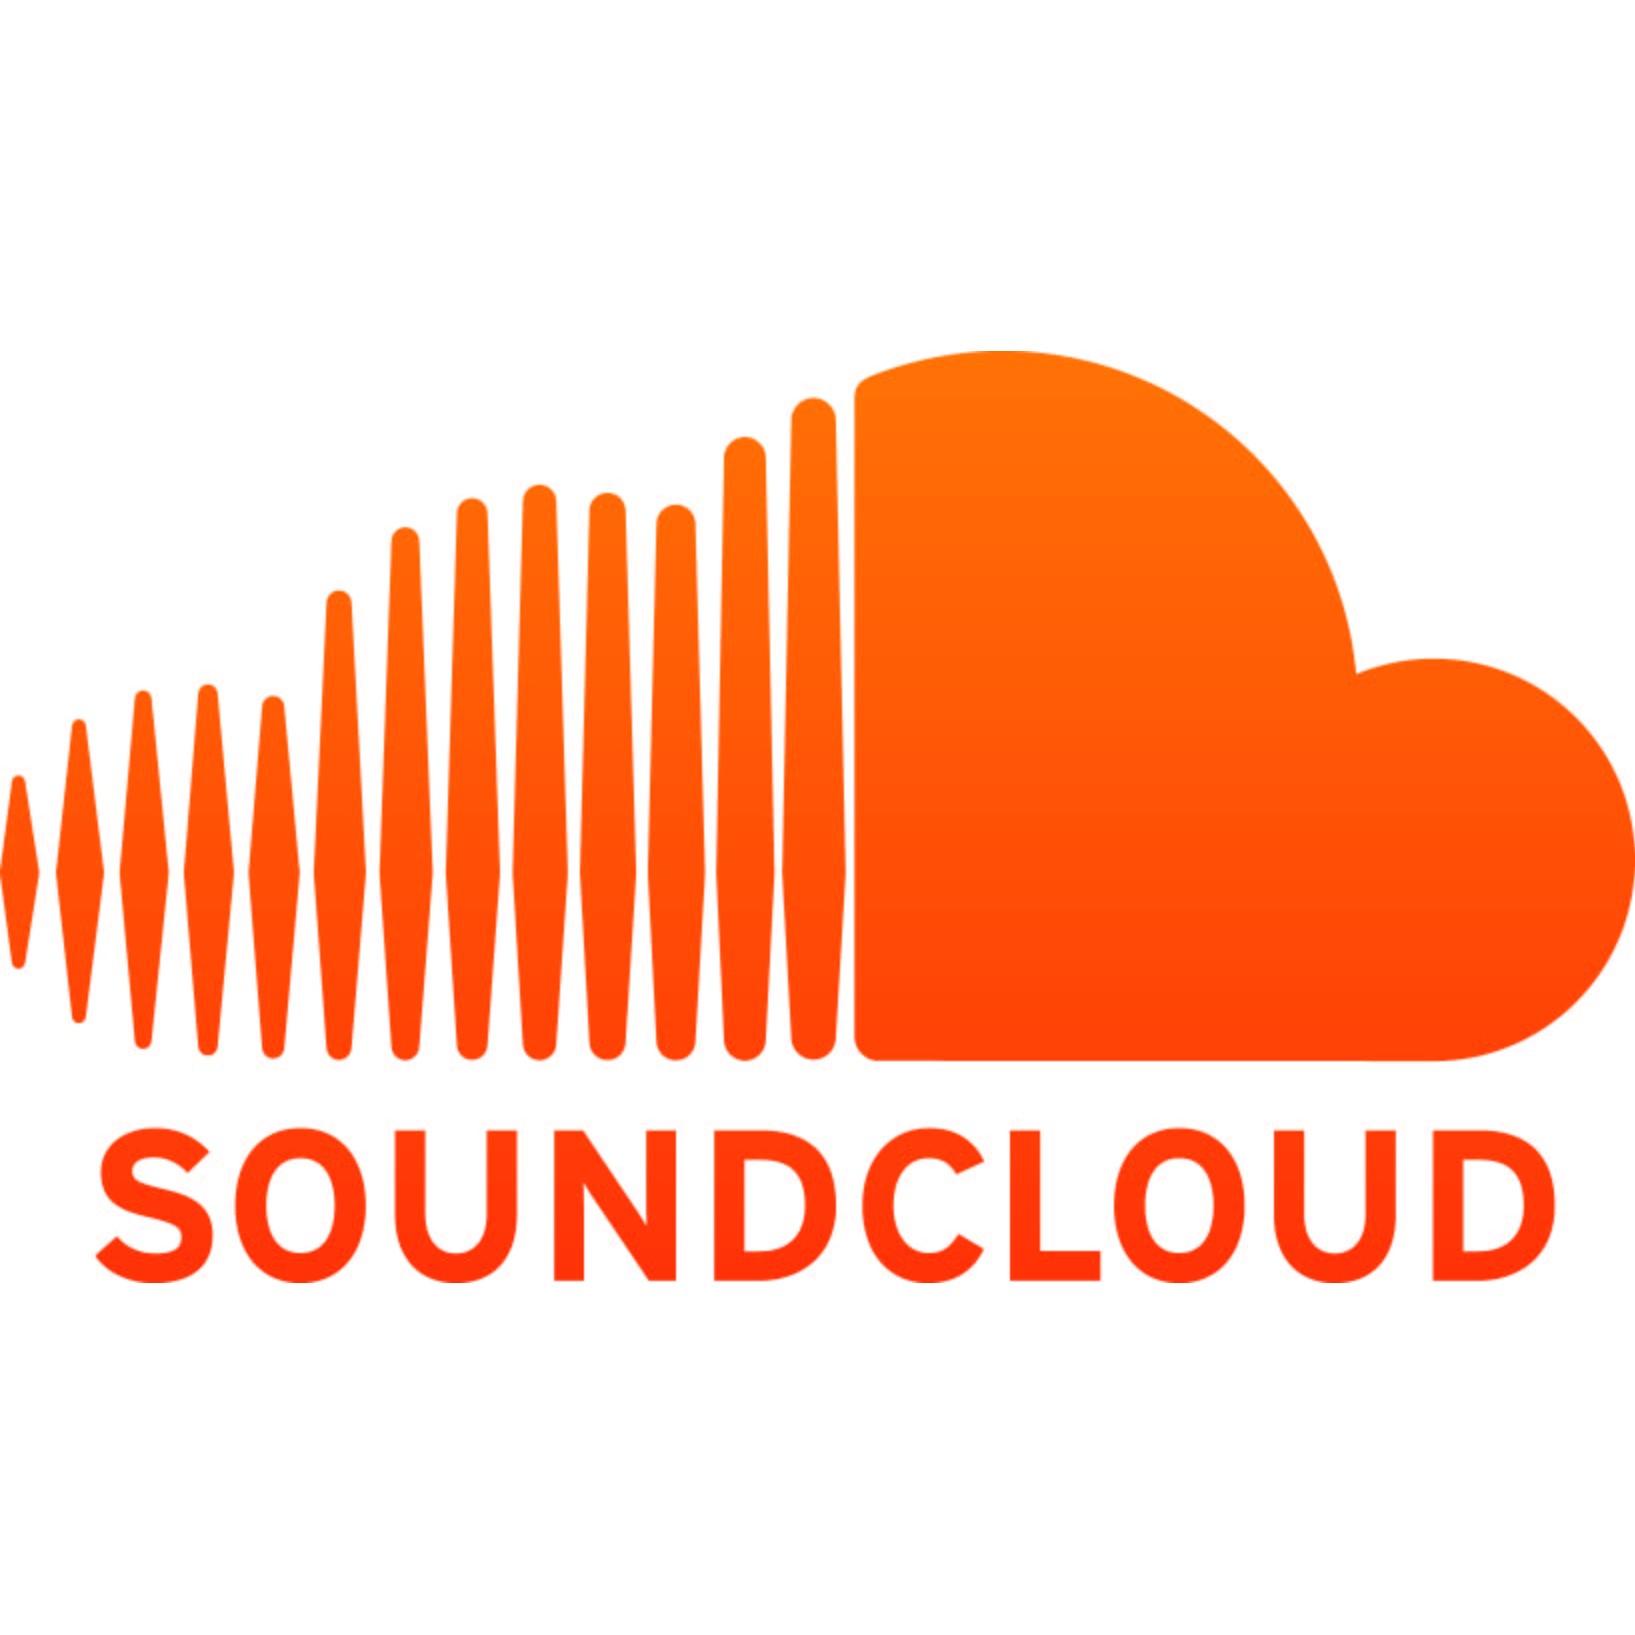 soundcloud_logo.jpg